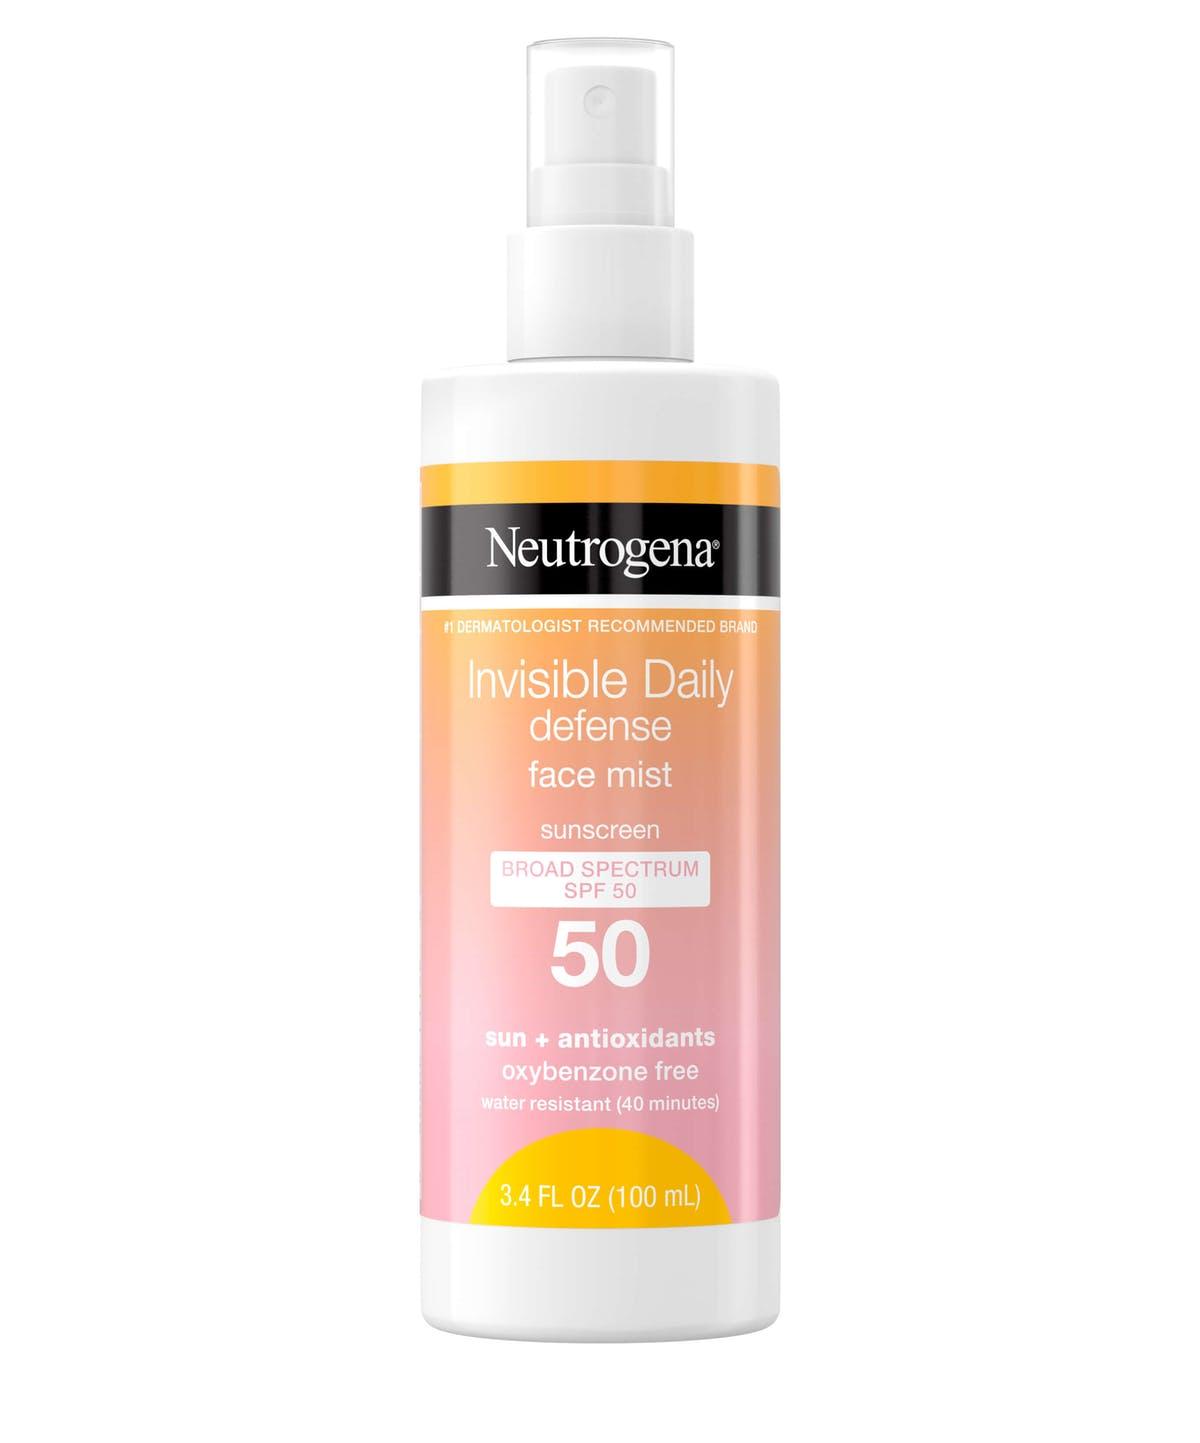 Neutrogena, Invisible Daily Defense Face Mist SPF 50